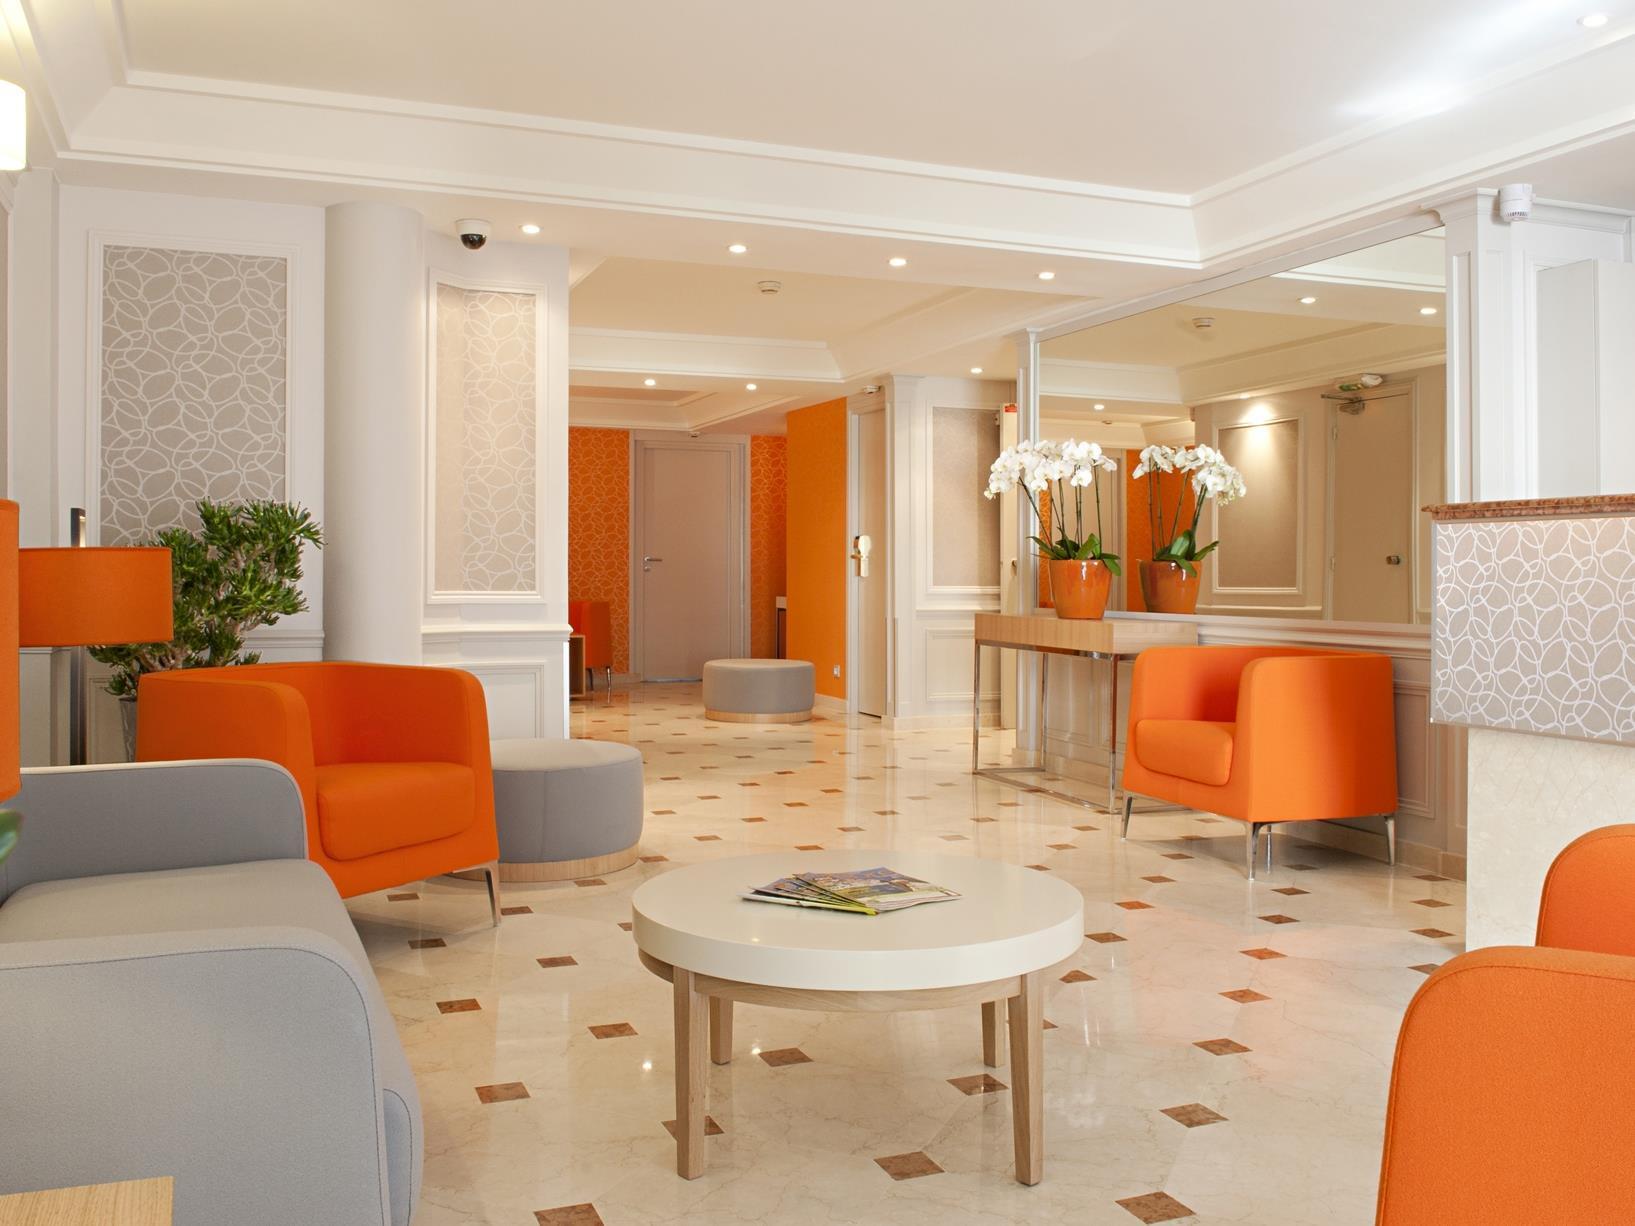 Hotel Touraine Opera - Hotell och Boende i Frankrike i Europa